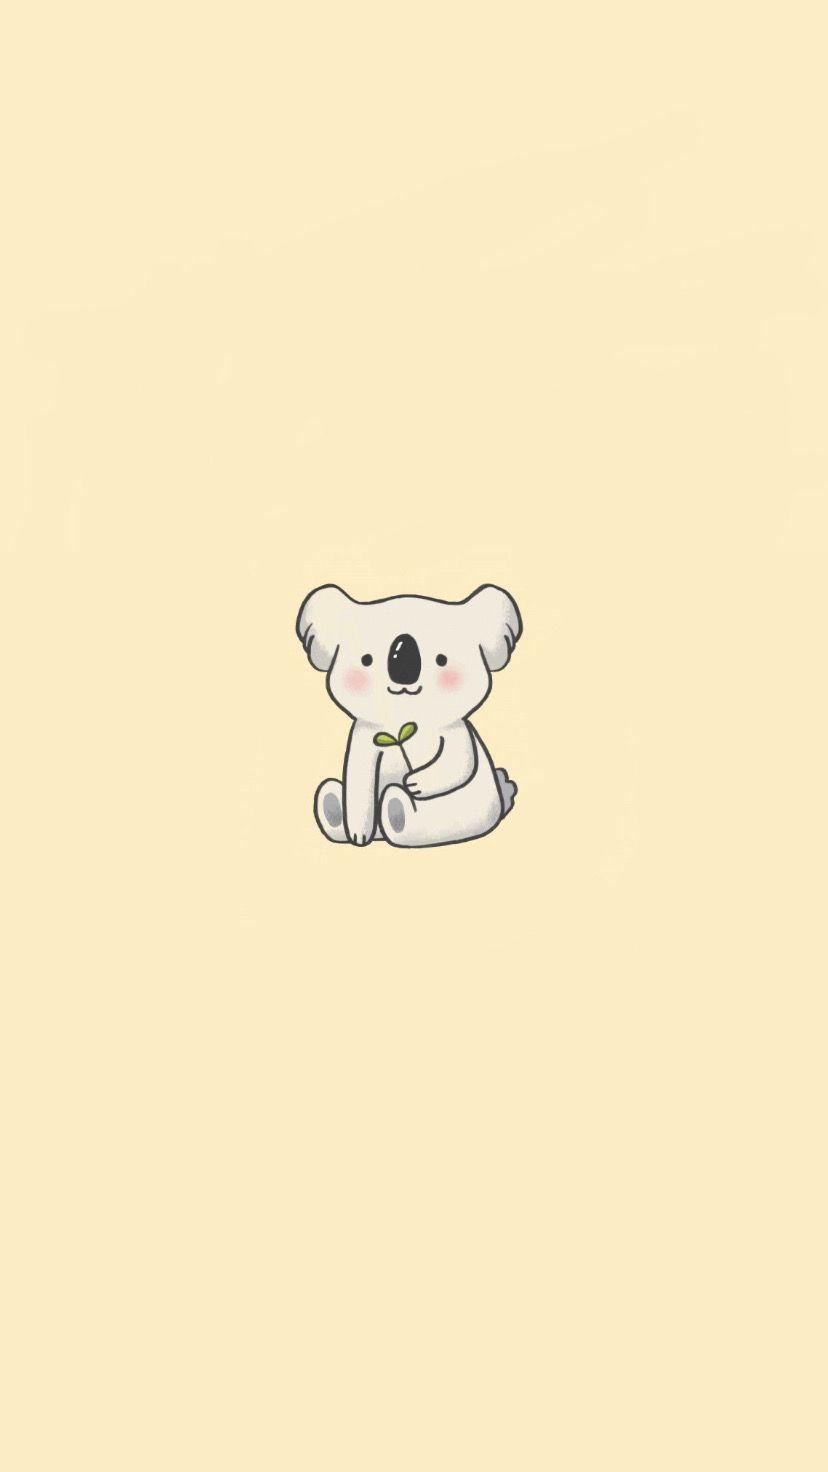 Koala Wallpaper